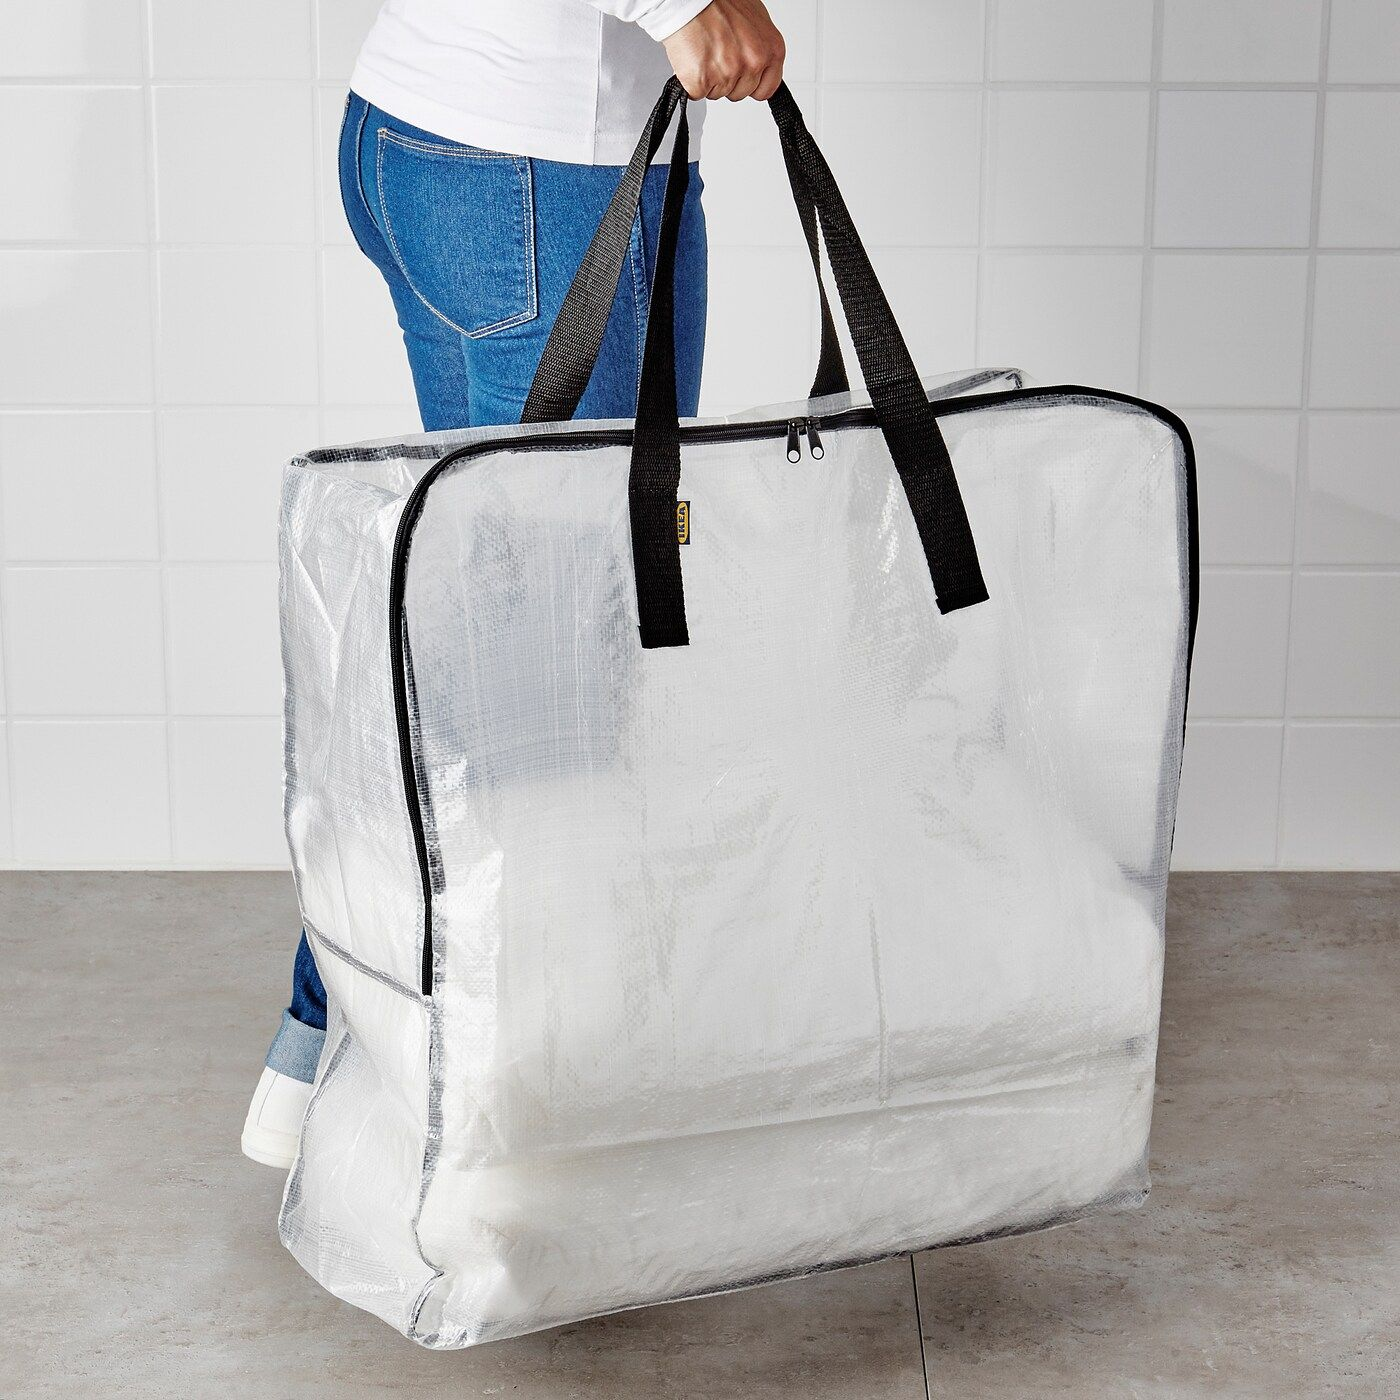 Ikea Dimpa Storage Bag Transparent In 2020 Bag Storage Ikea Dimpa Large Storage Bags